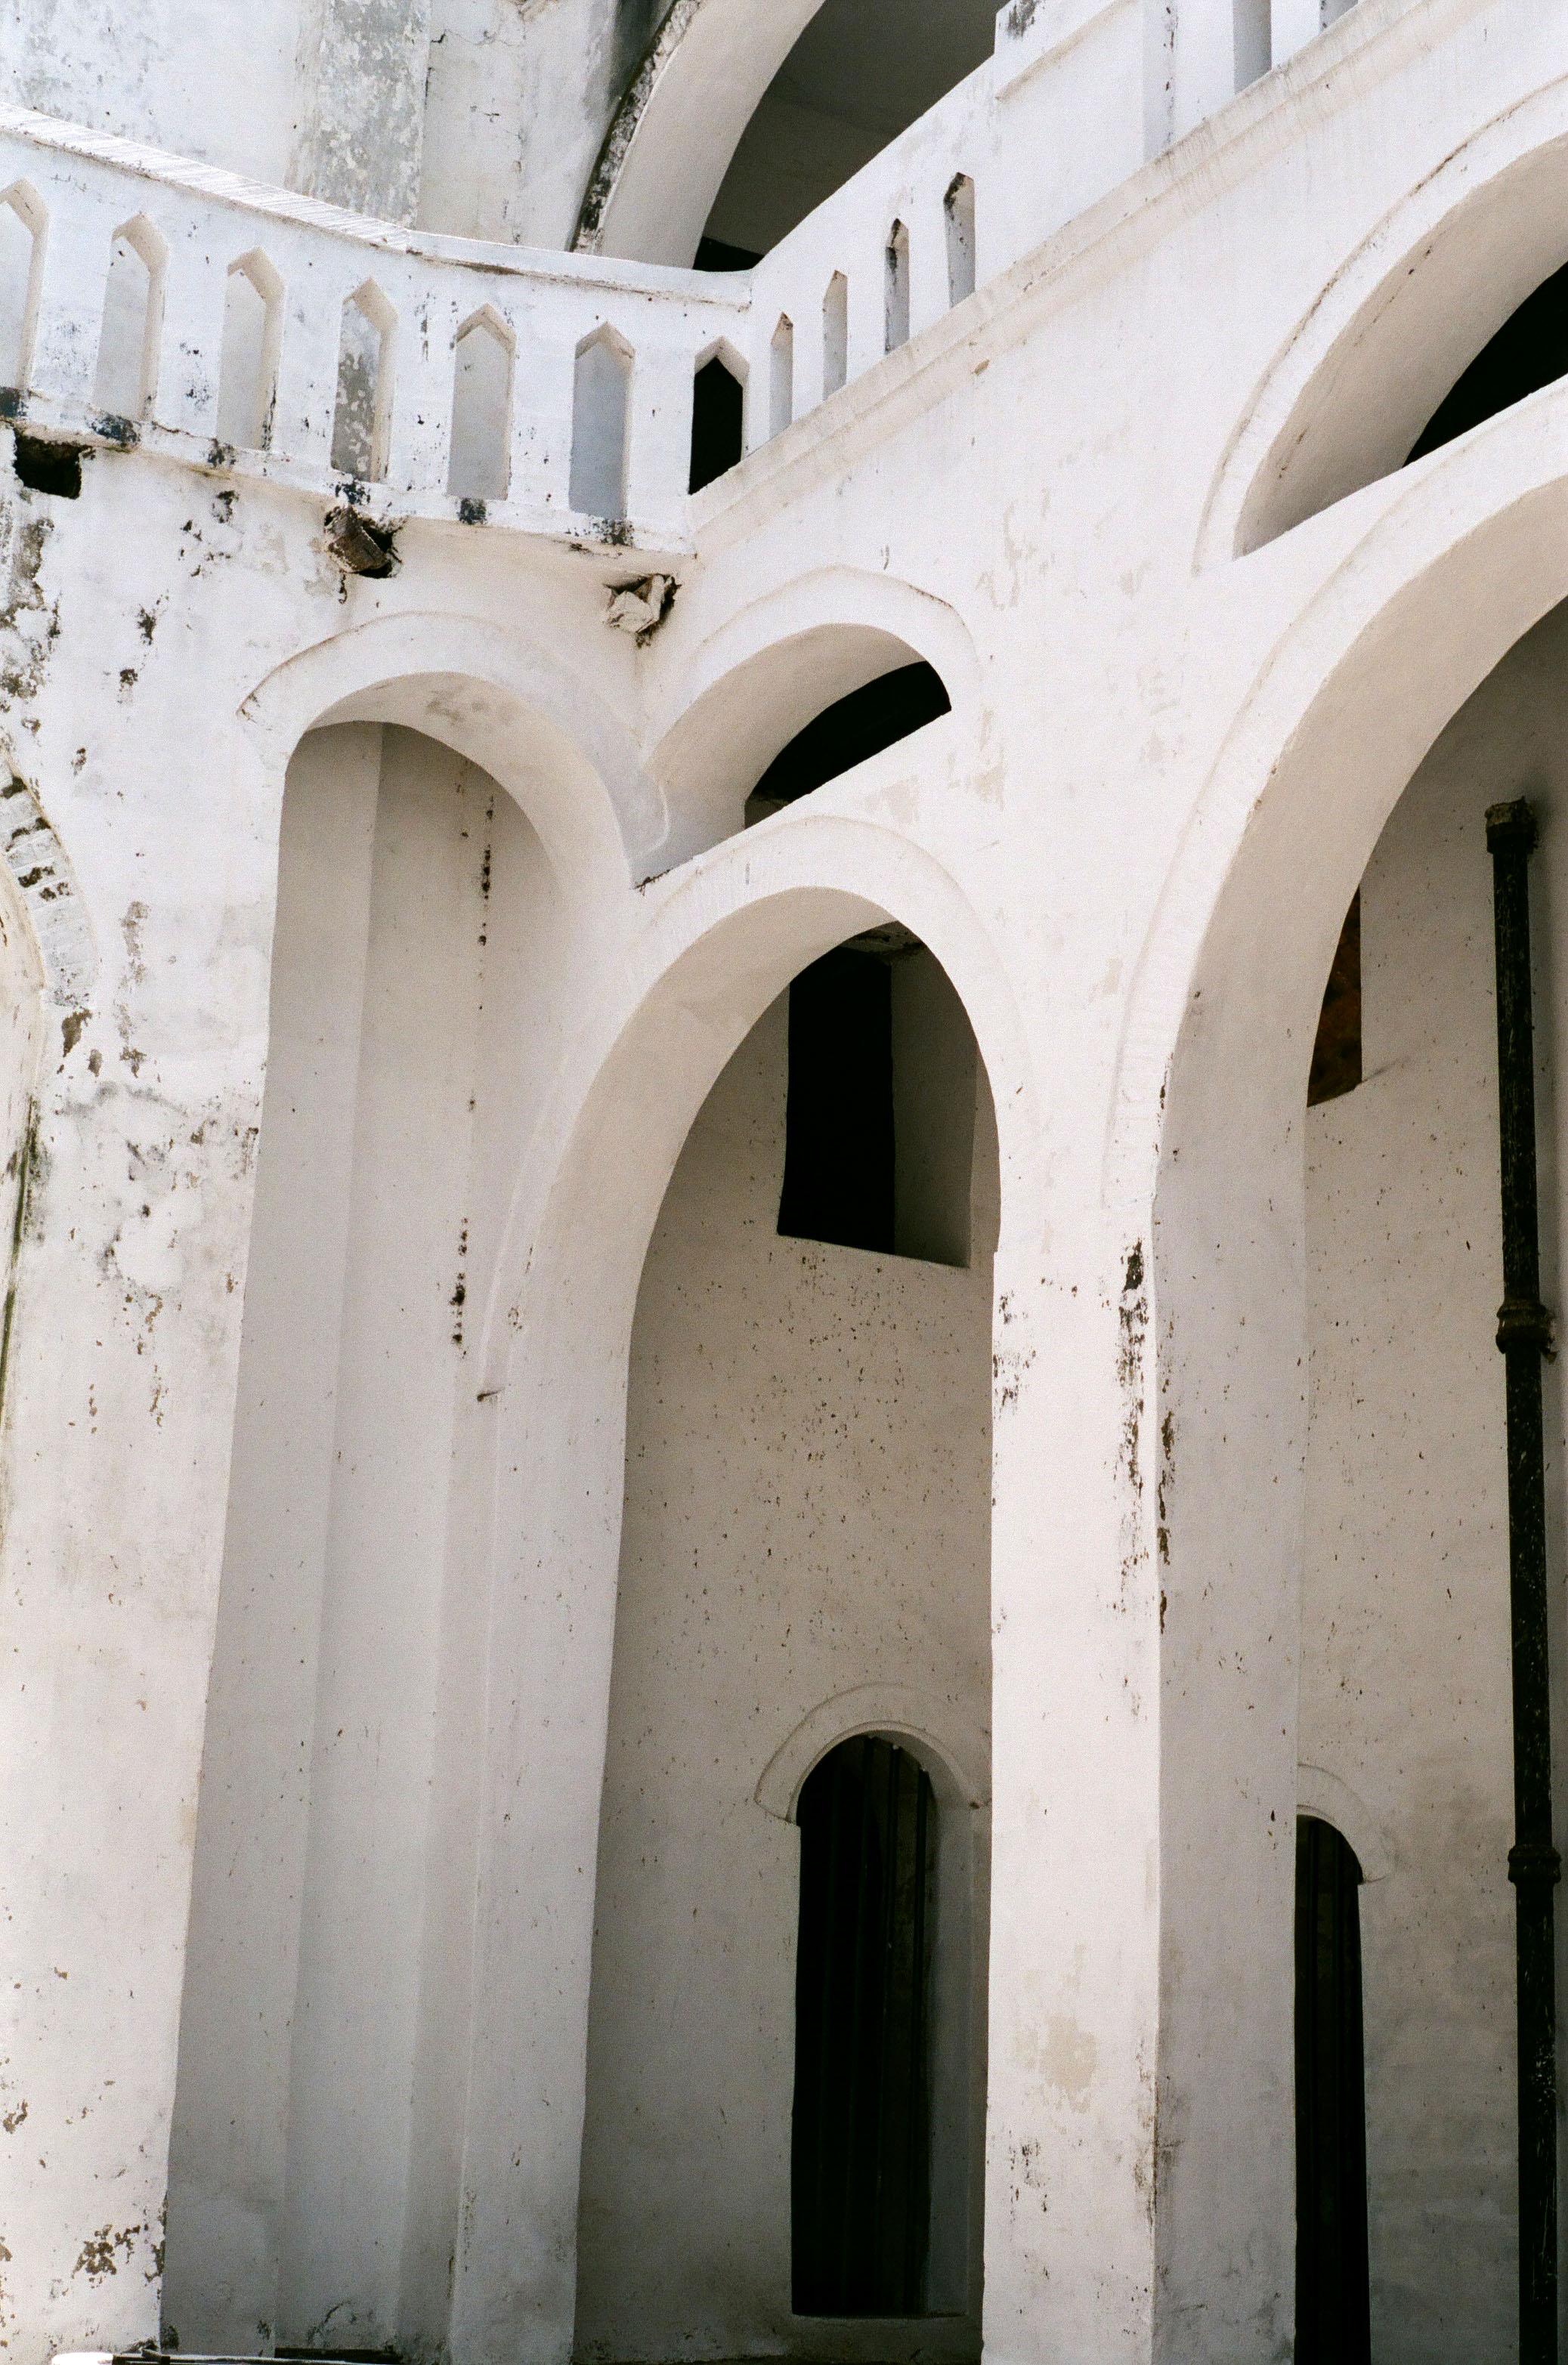 Arches in Elmina Castle